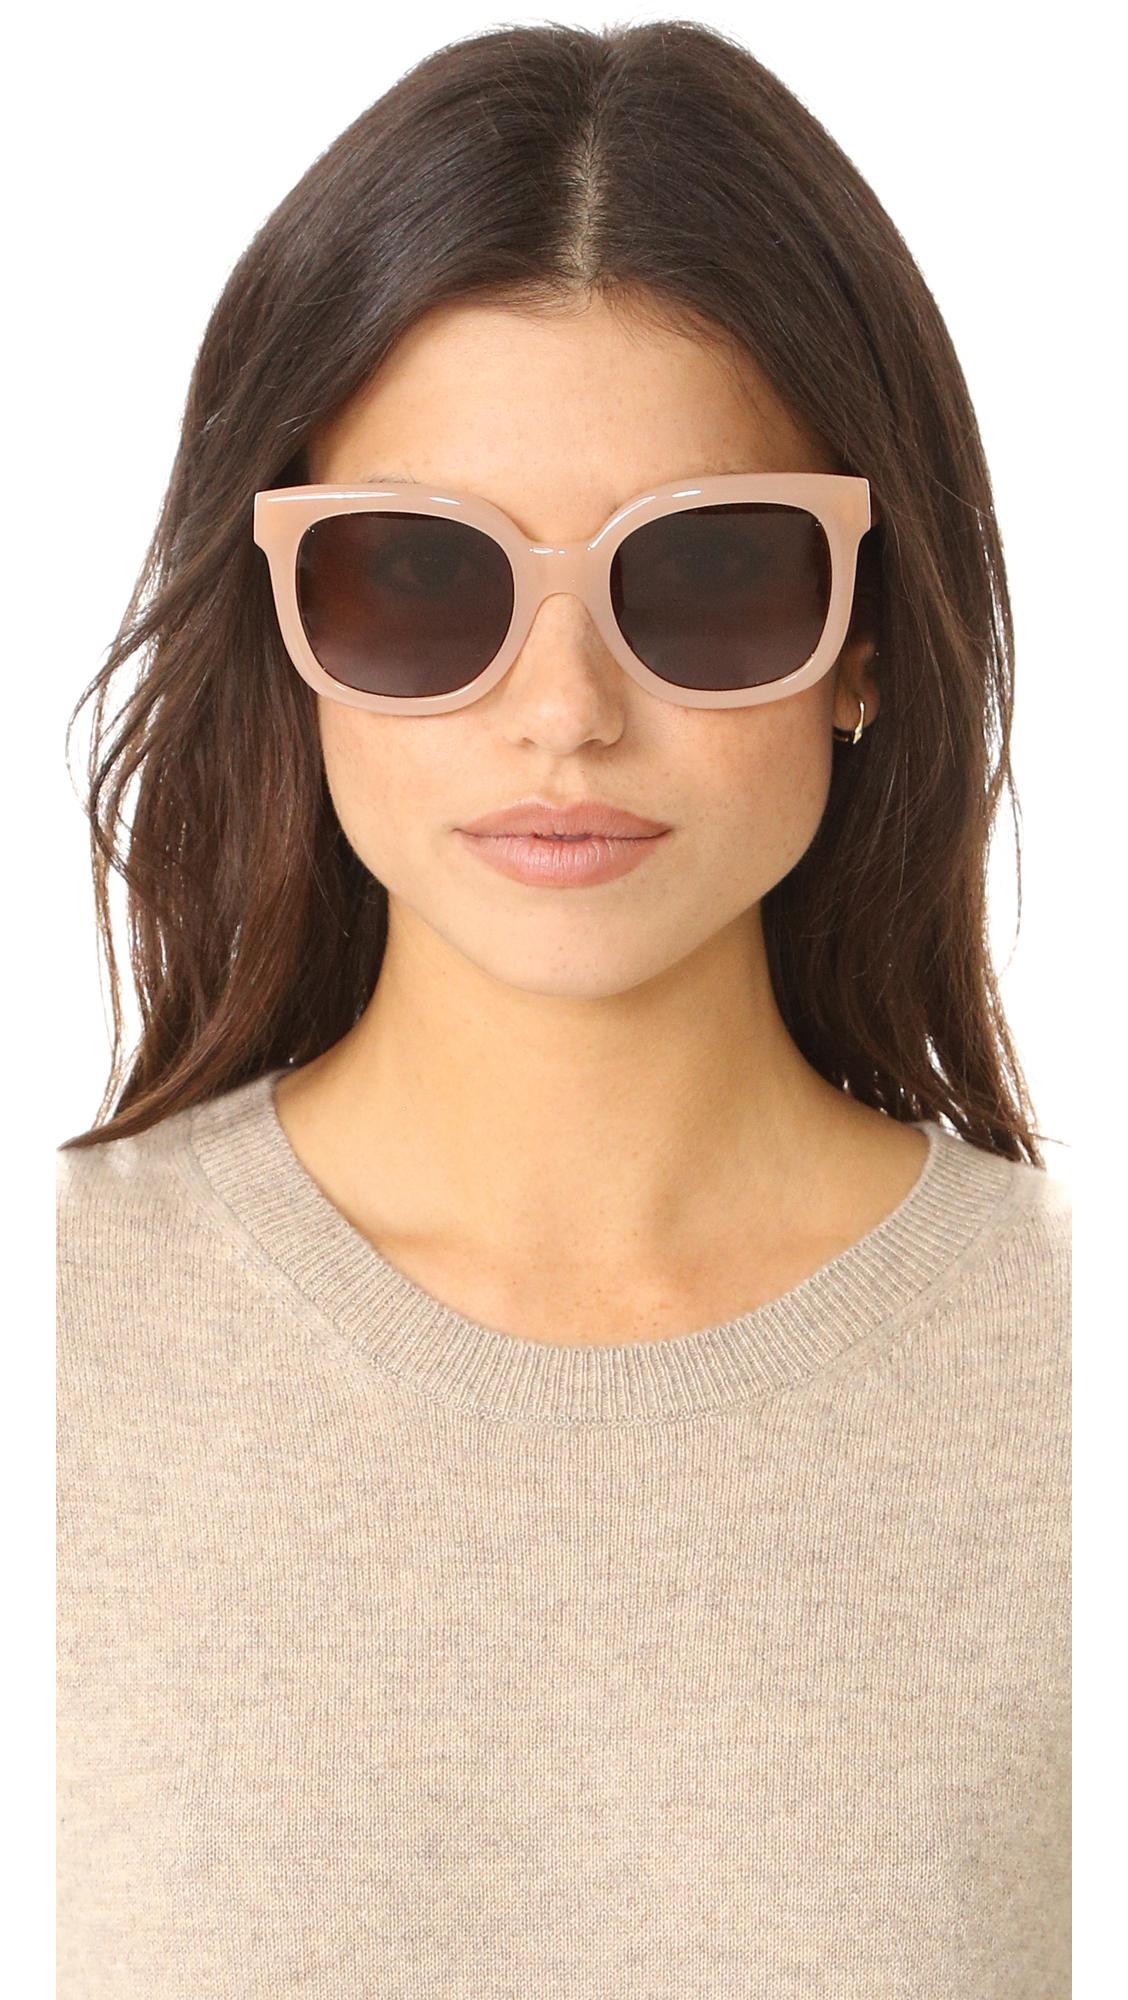 0b89ff48d5 Tory Burch Square Sunglasses